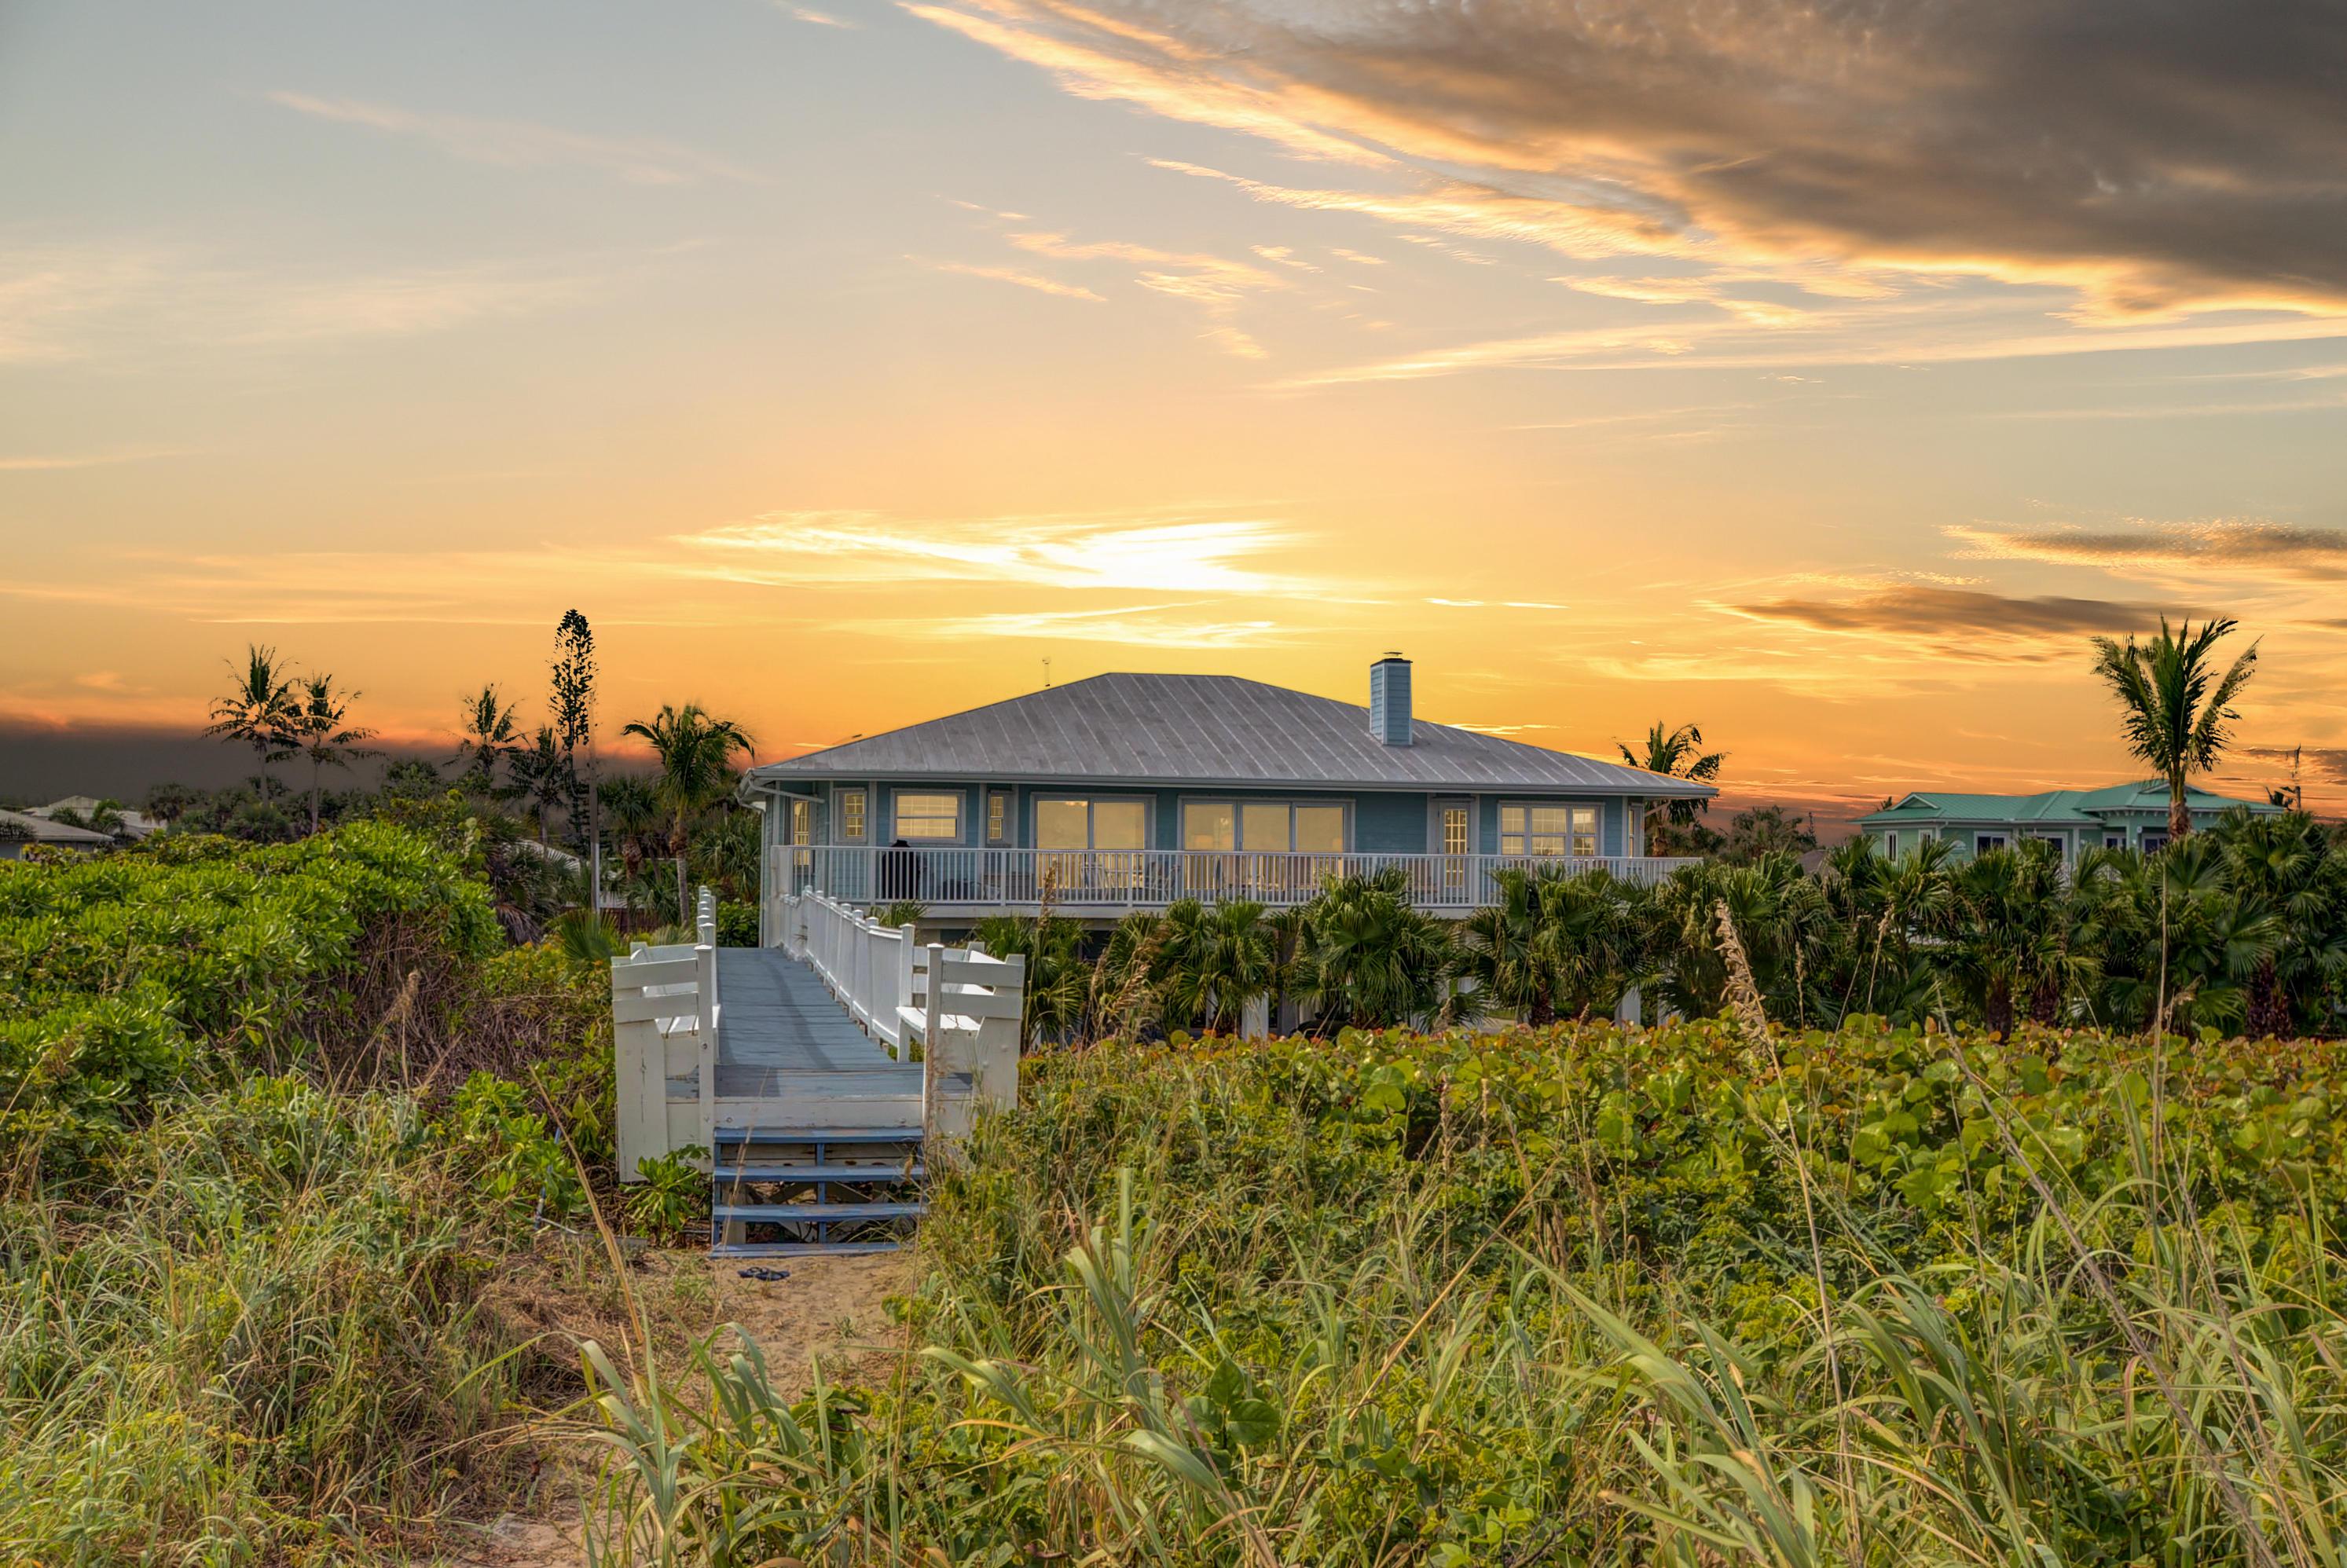 HUTCHINSON ISLAND HOMES